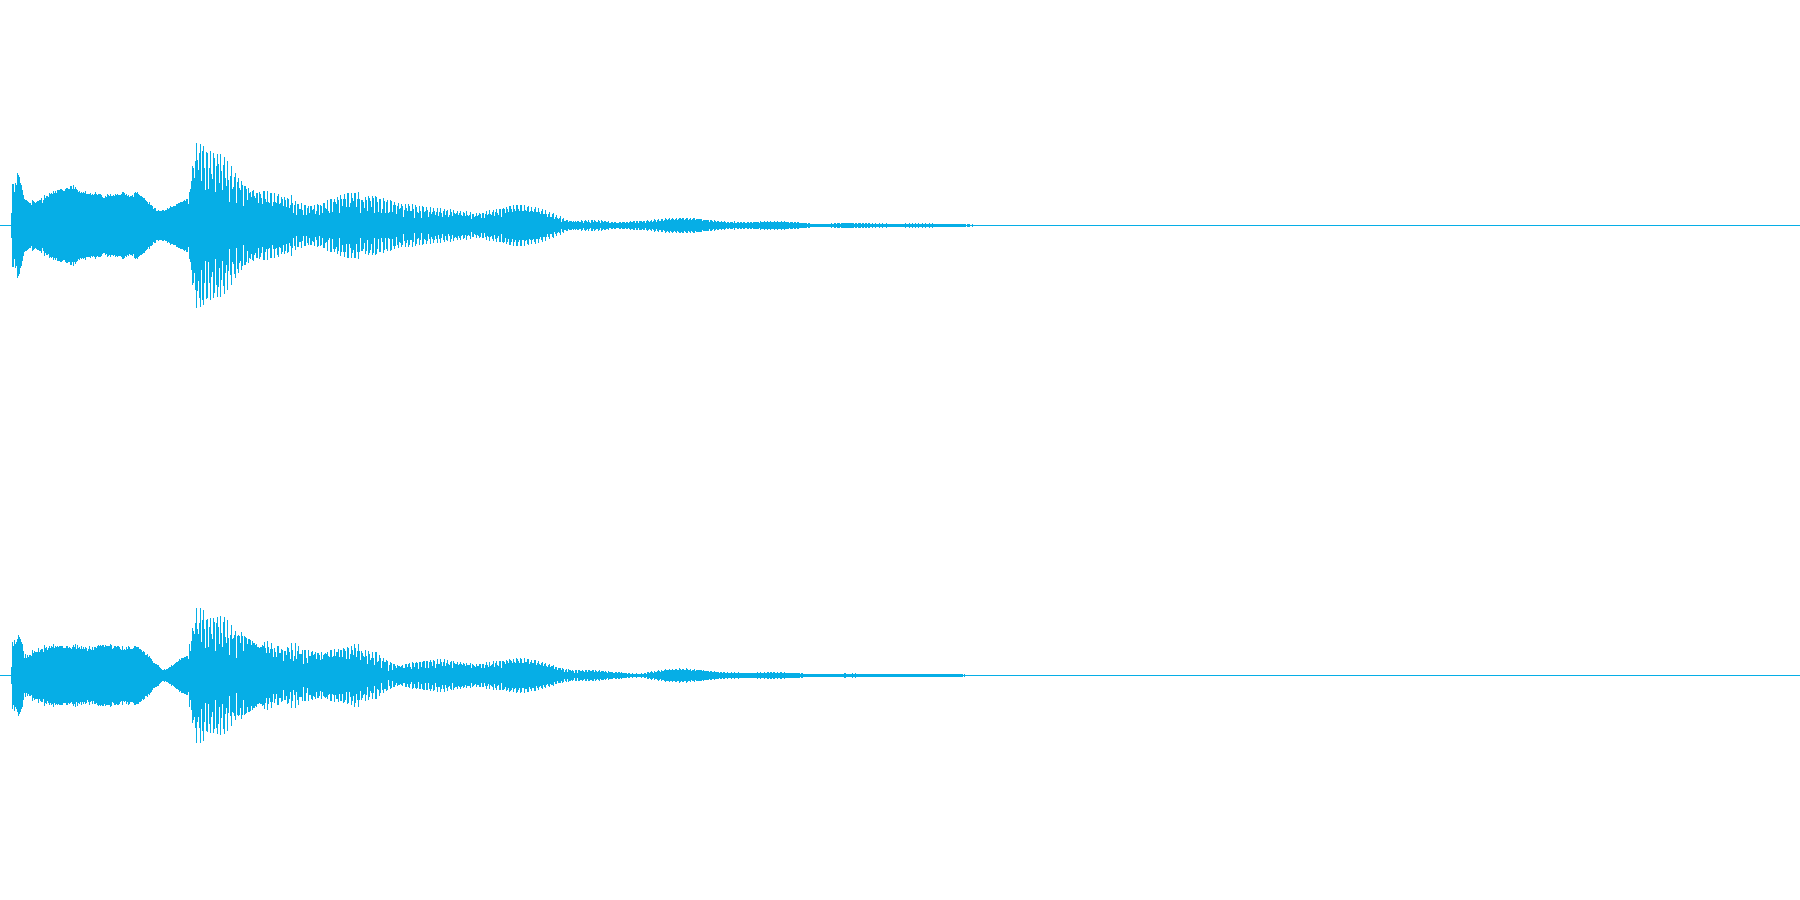 KANTアイキャッチ05271の再生済みの波形